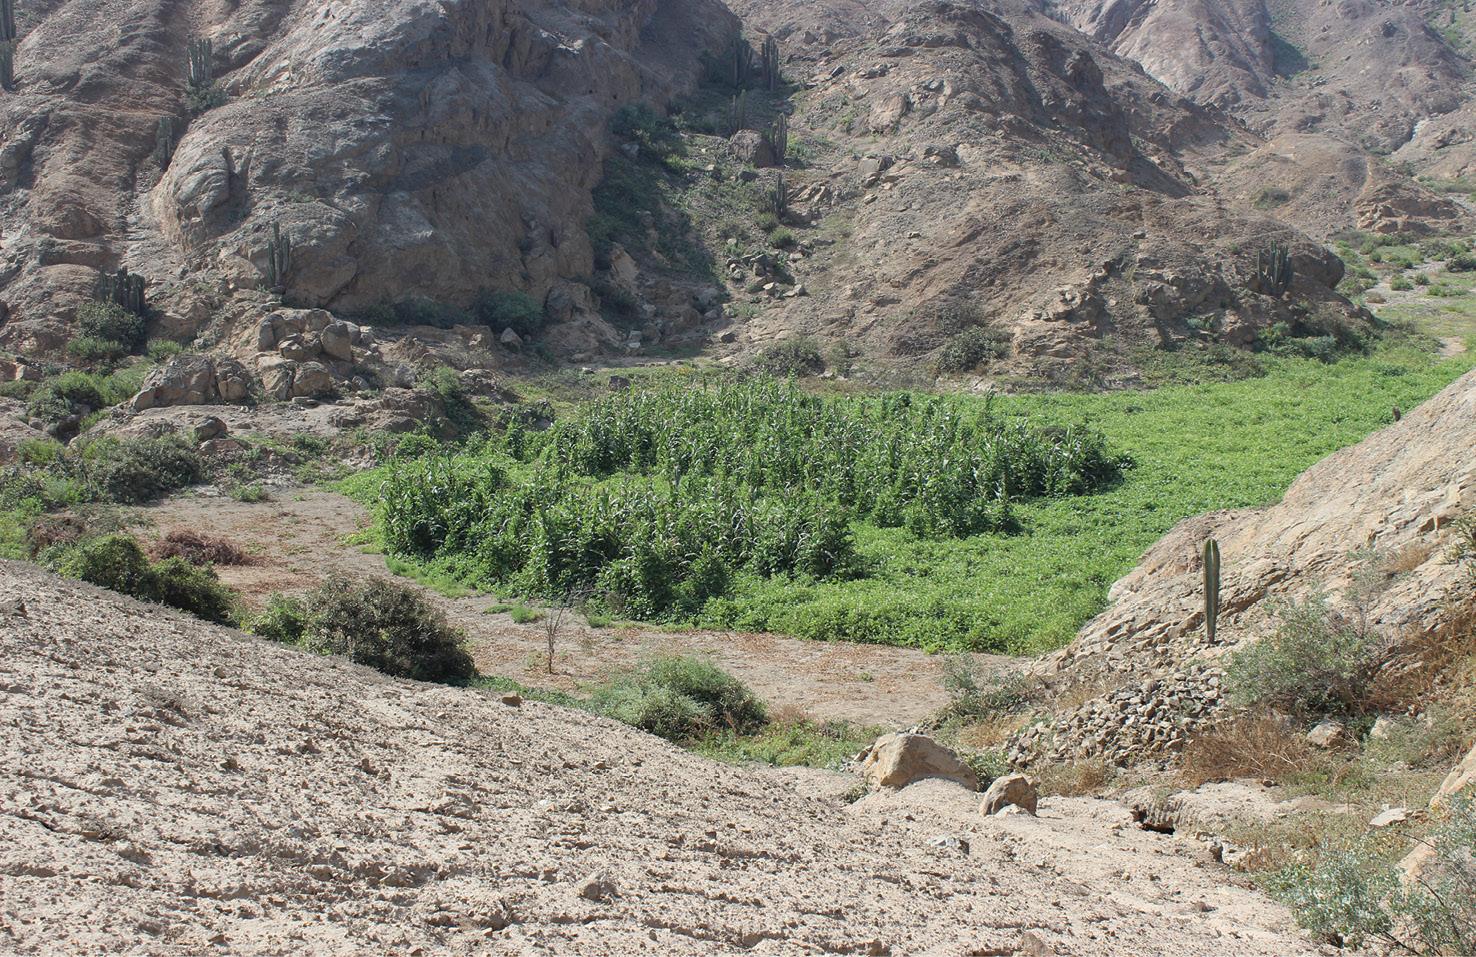 Pre-Hispanic flood-management in the Pampa de Mocan